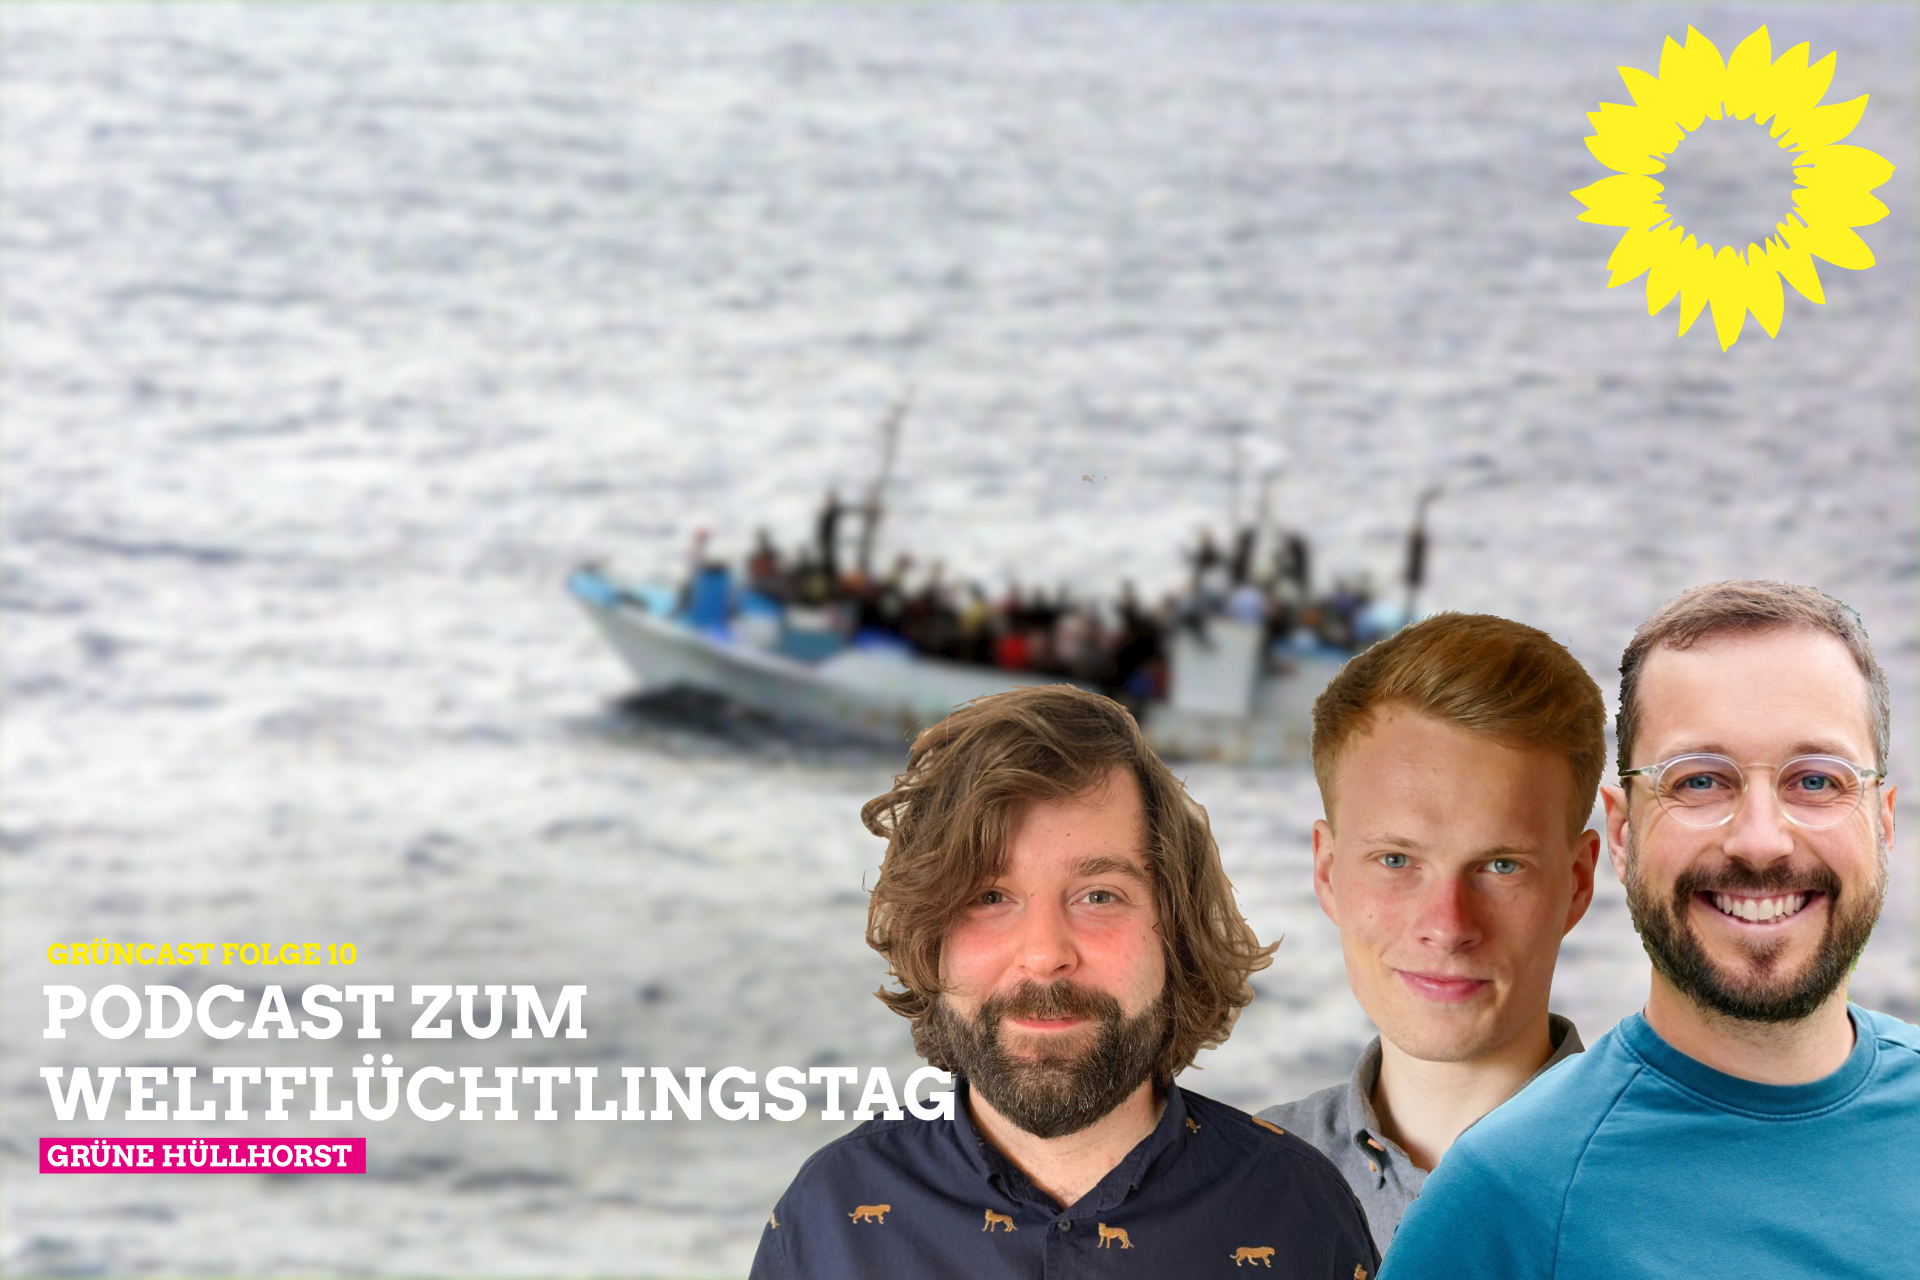 Grüncast 10: Podcast zum Weltflüchtlingstag mit der Seebrücke Hüllhorst